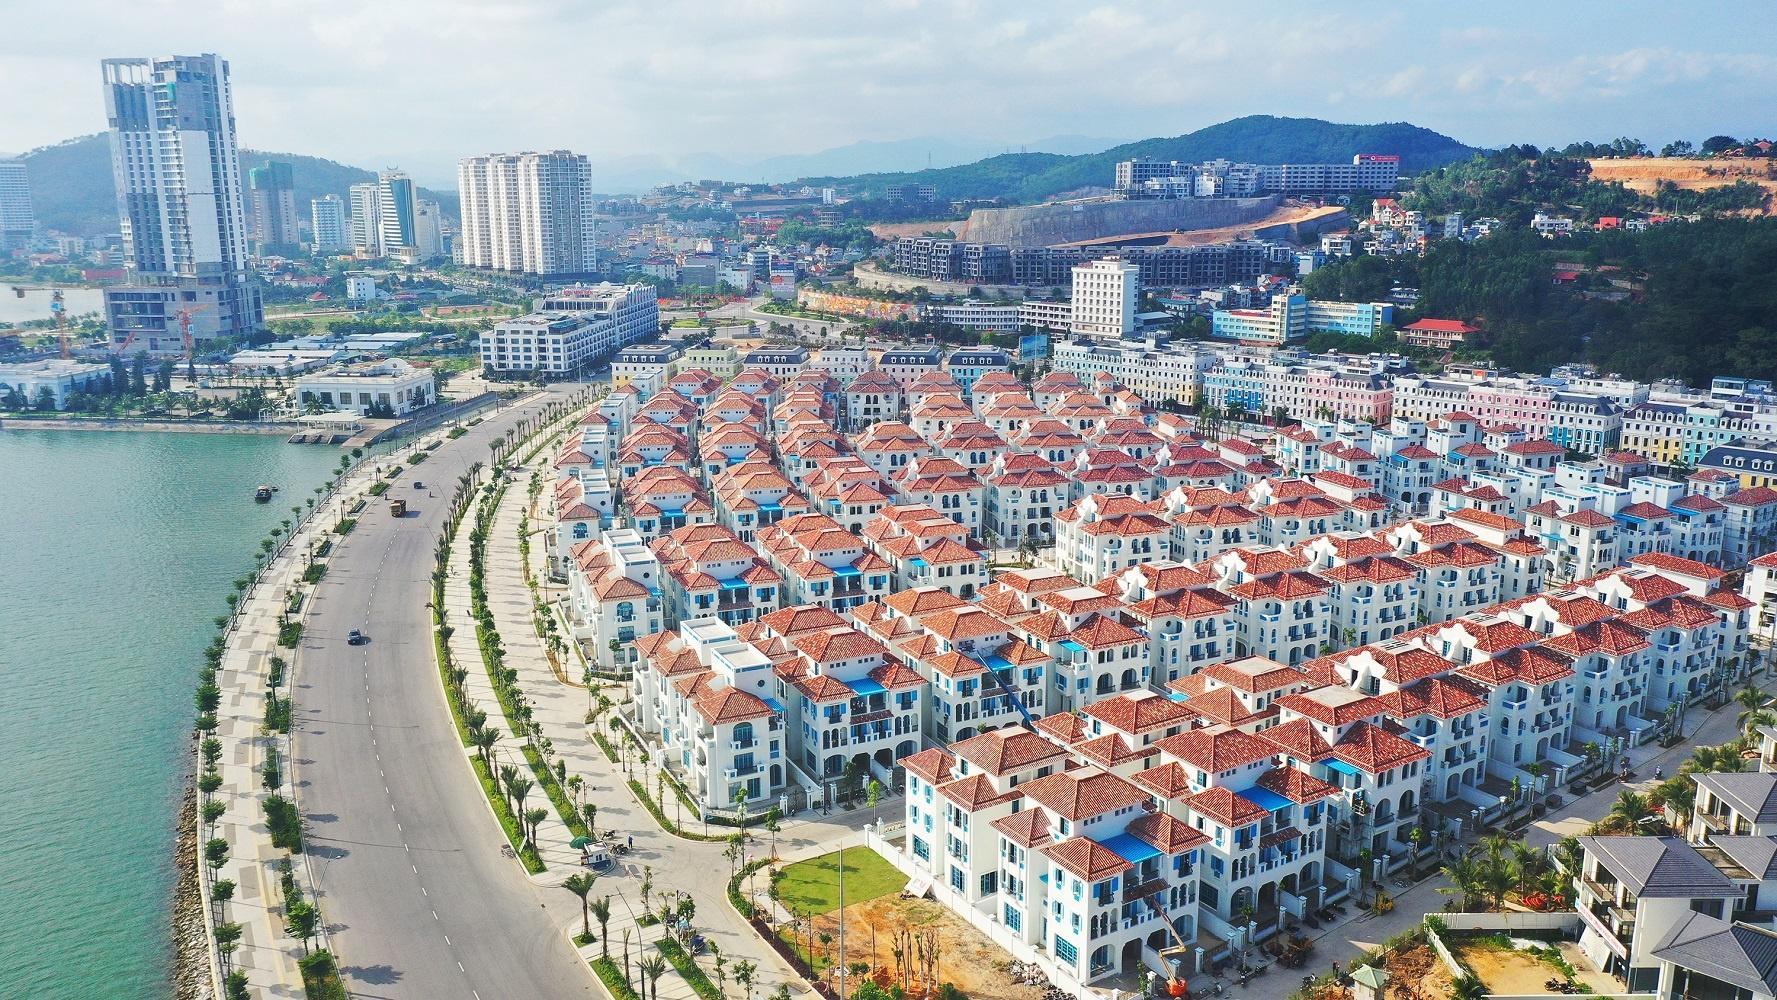 Sun Group anh 2  - Sun_Grand_City_Feria_xuat_sac_chien_thang_hang_muc_Du_an_phuc_hop_tot_nhat_Viet_Nam_tai_APPA_2021 - Sun Property thắng nhiều giải quan trọng tại APPA 2021